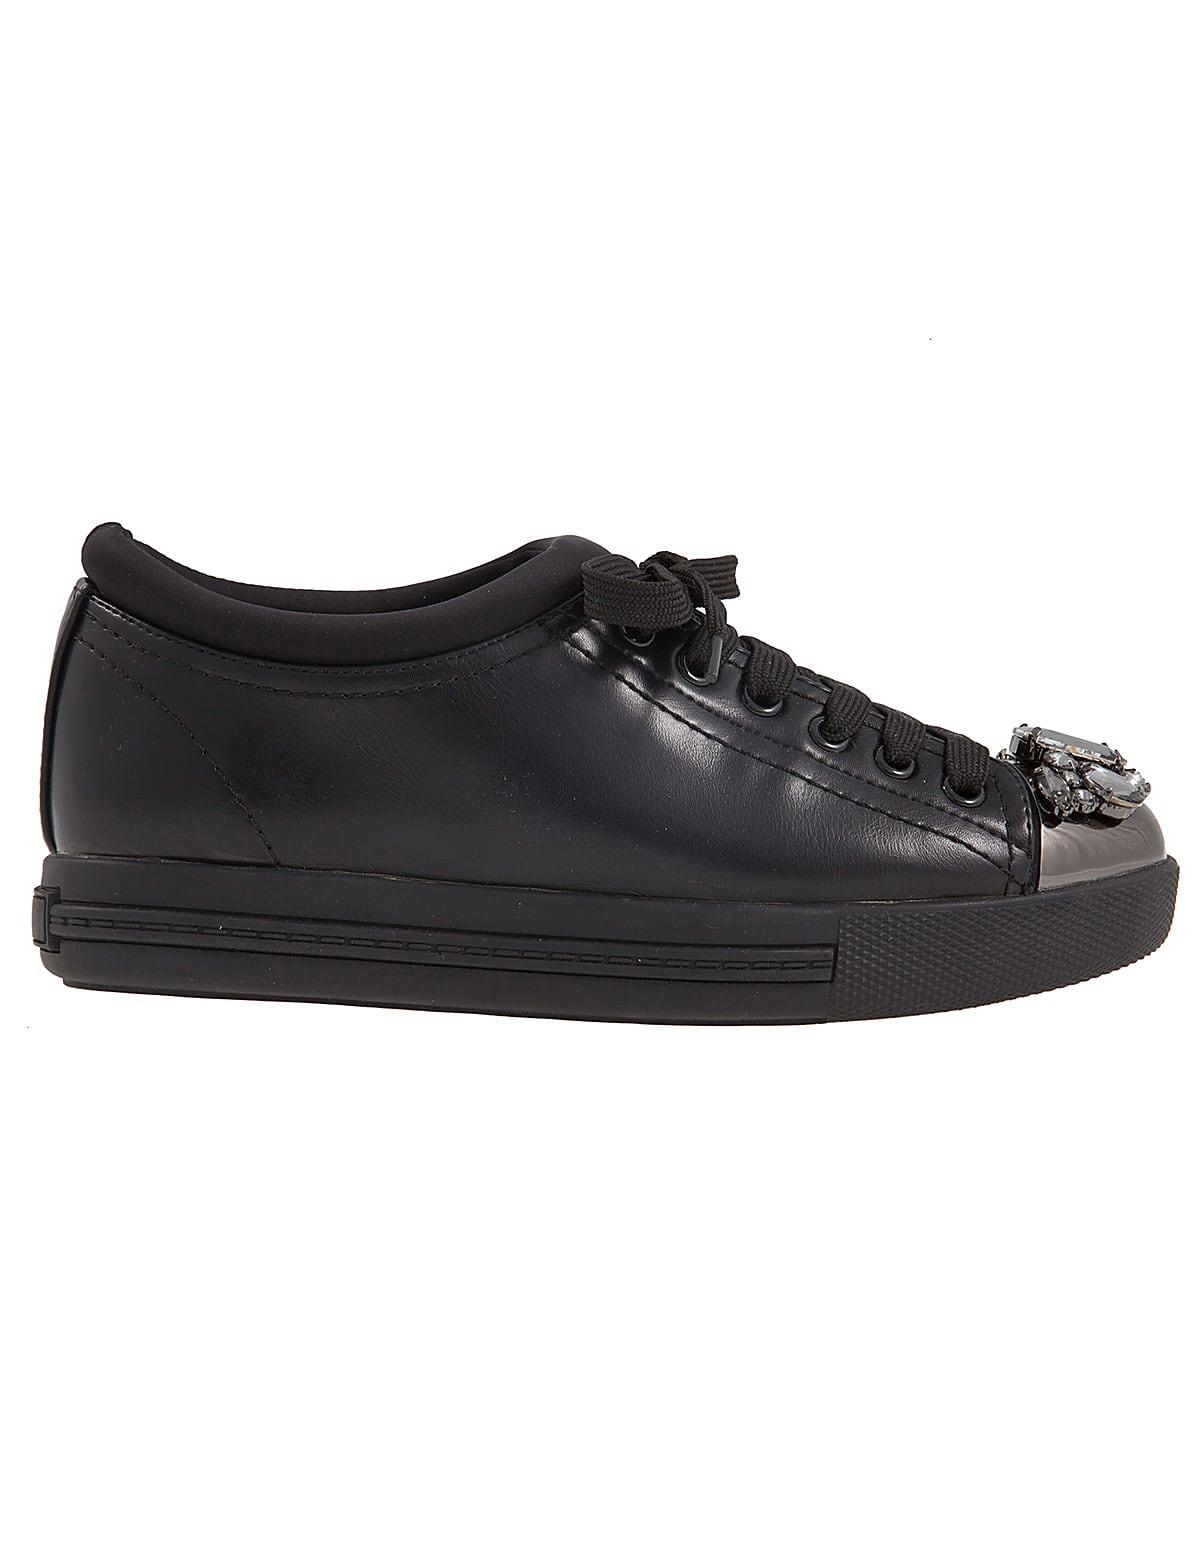 Divine Black mrs fred   sneakers